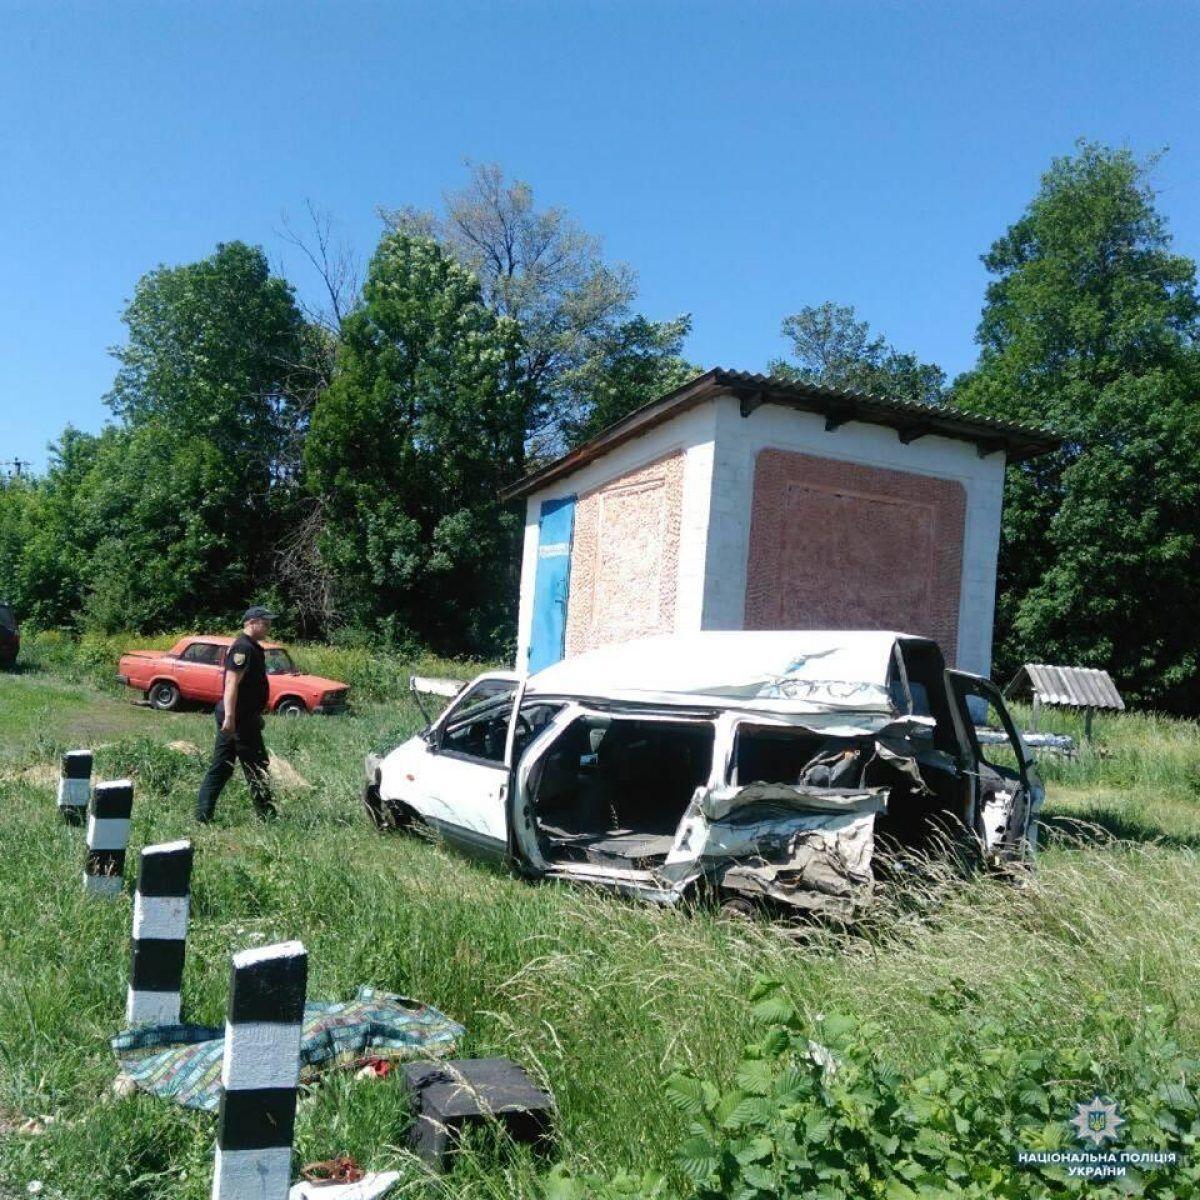 26-летняя пассажирка погибла на месте